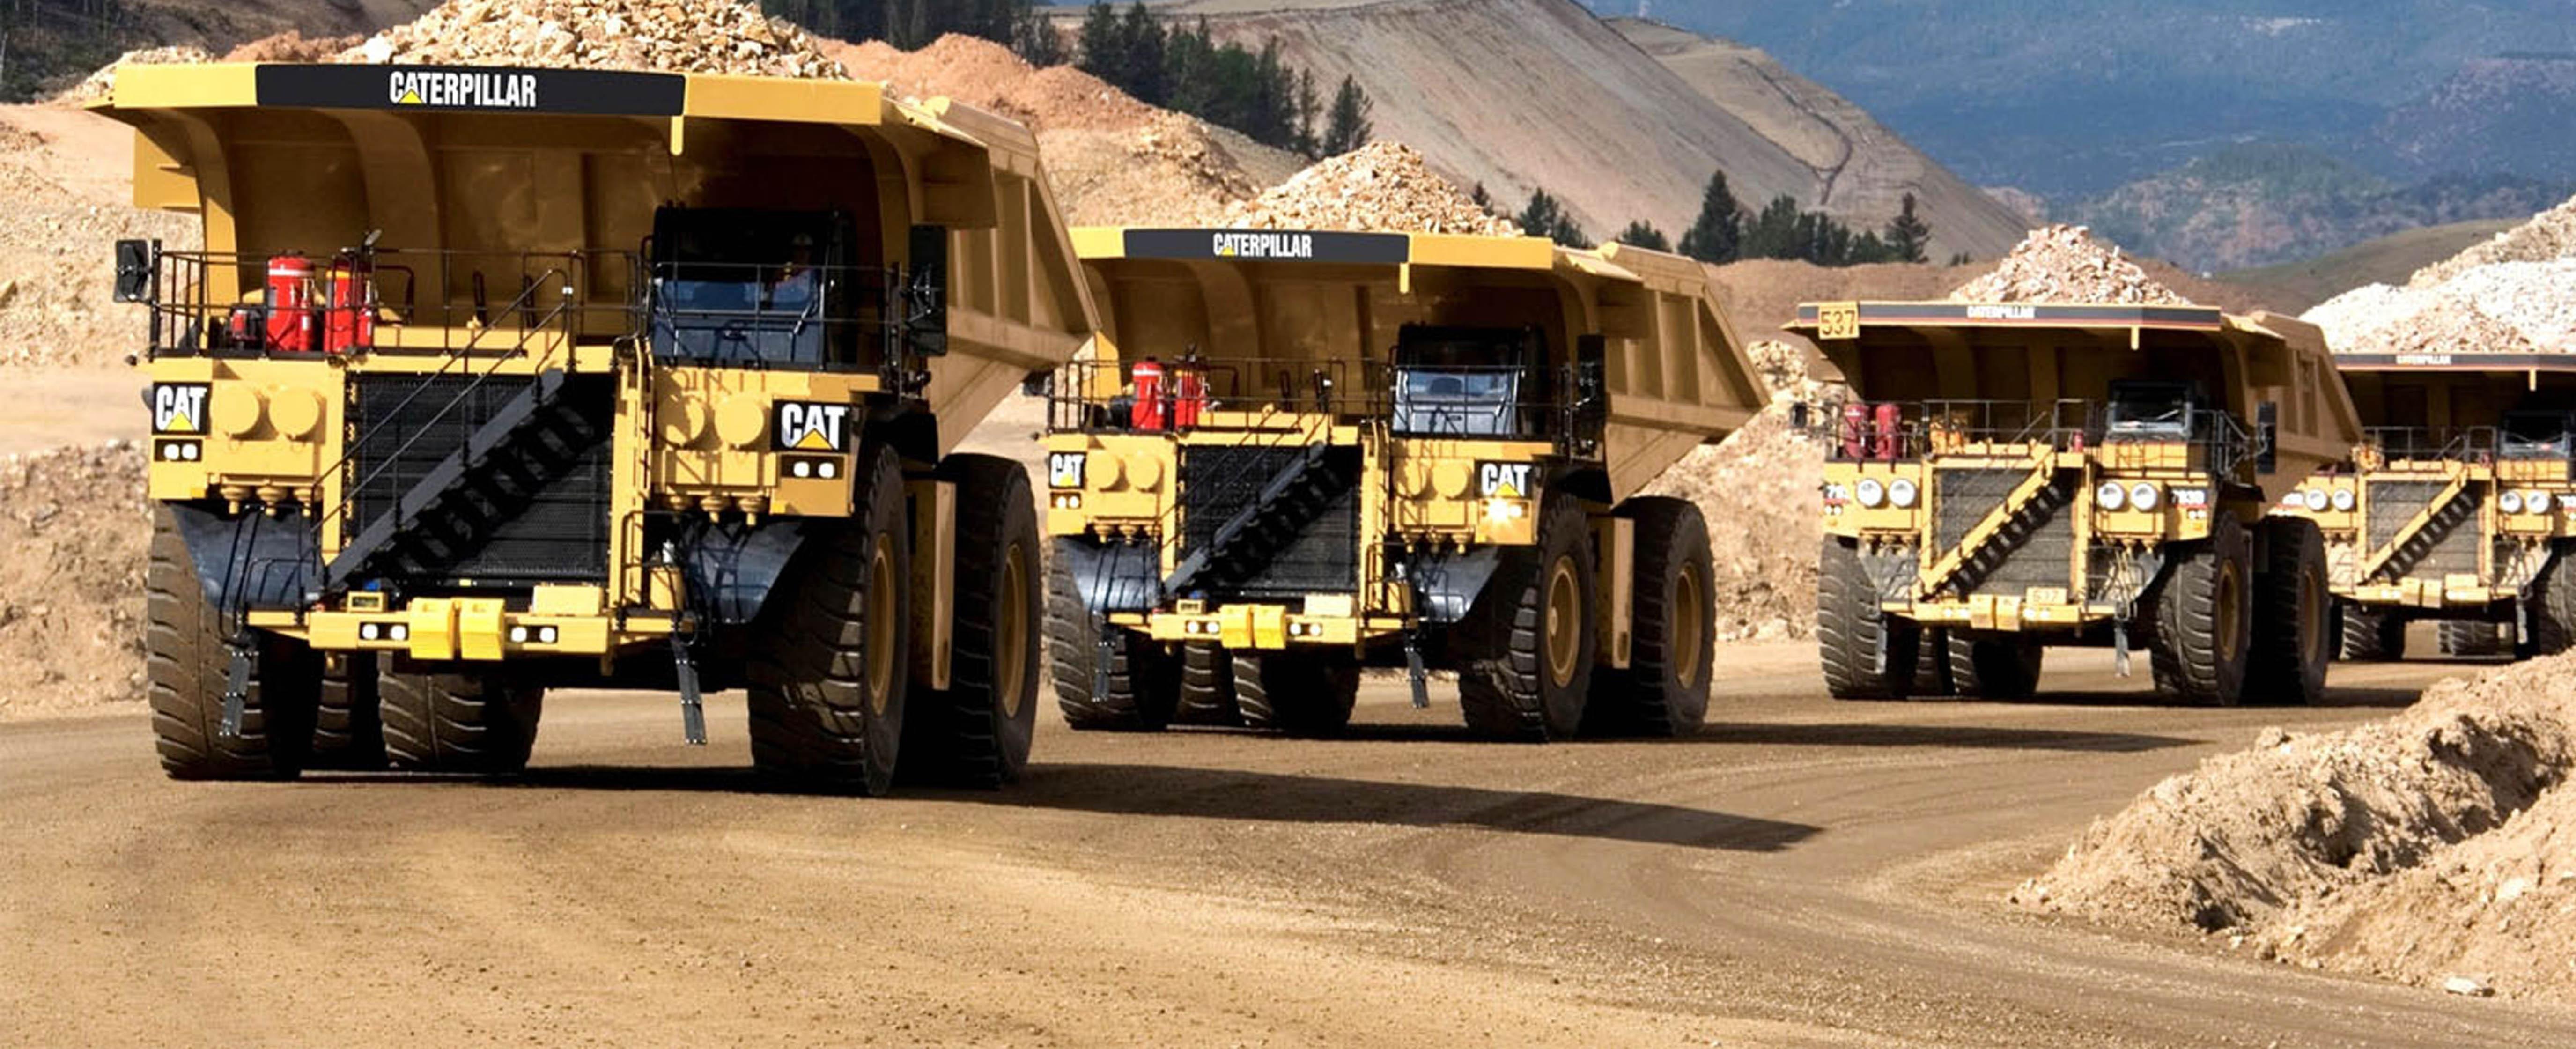 Control de calidad de maquinaria es crucial en el éxito de una minera